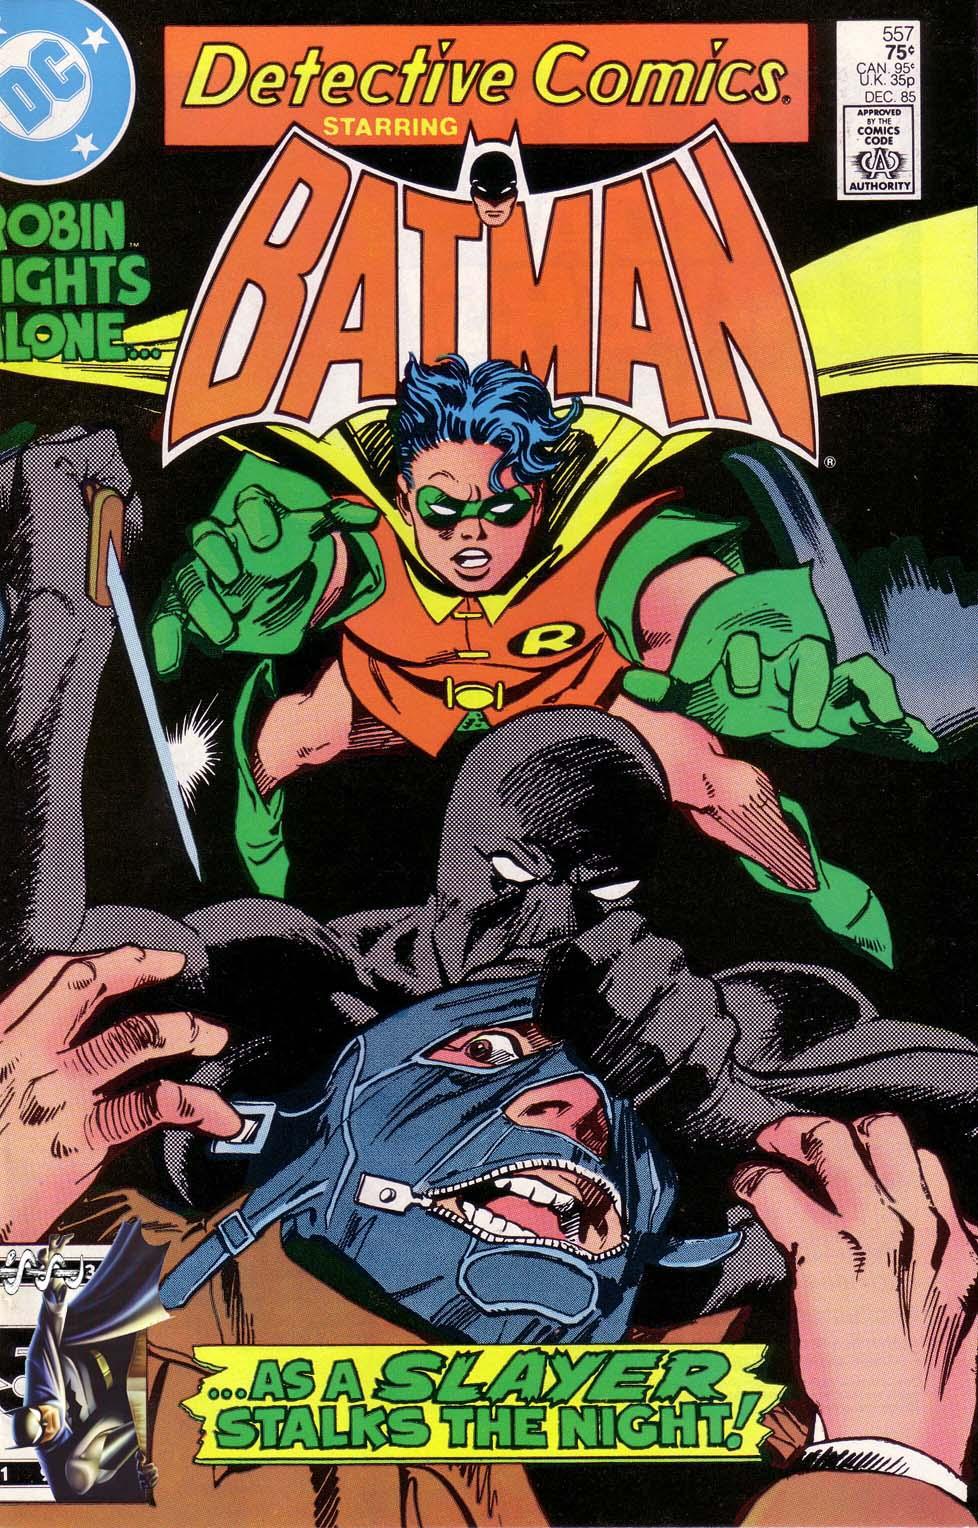 Detective Comics (1937) 557 Page 1